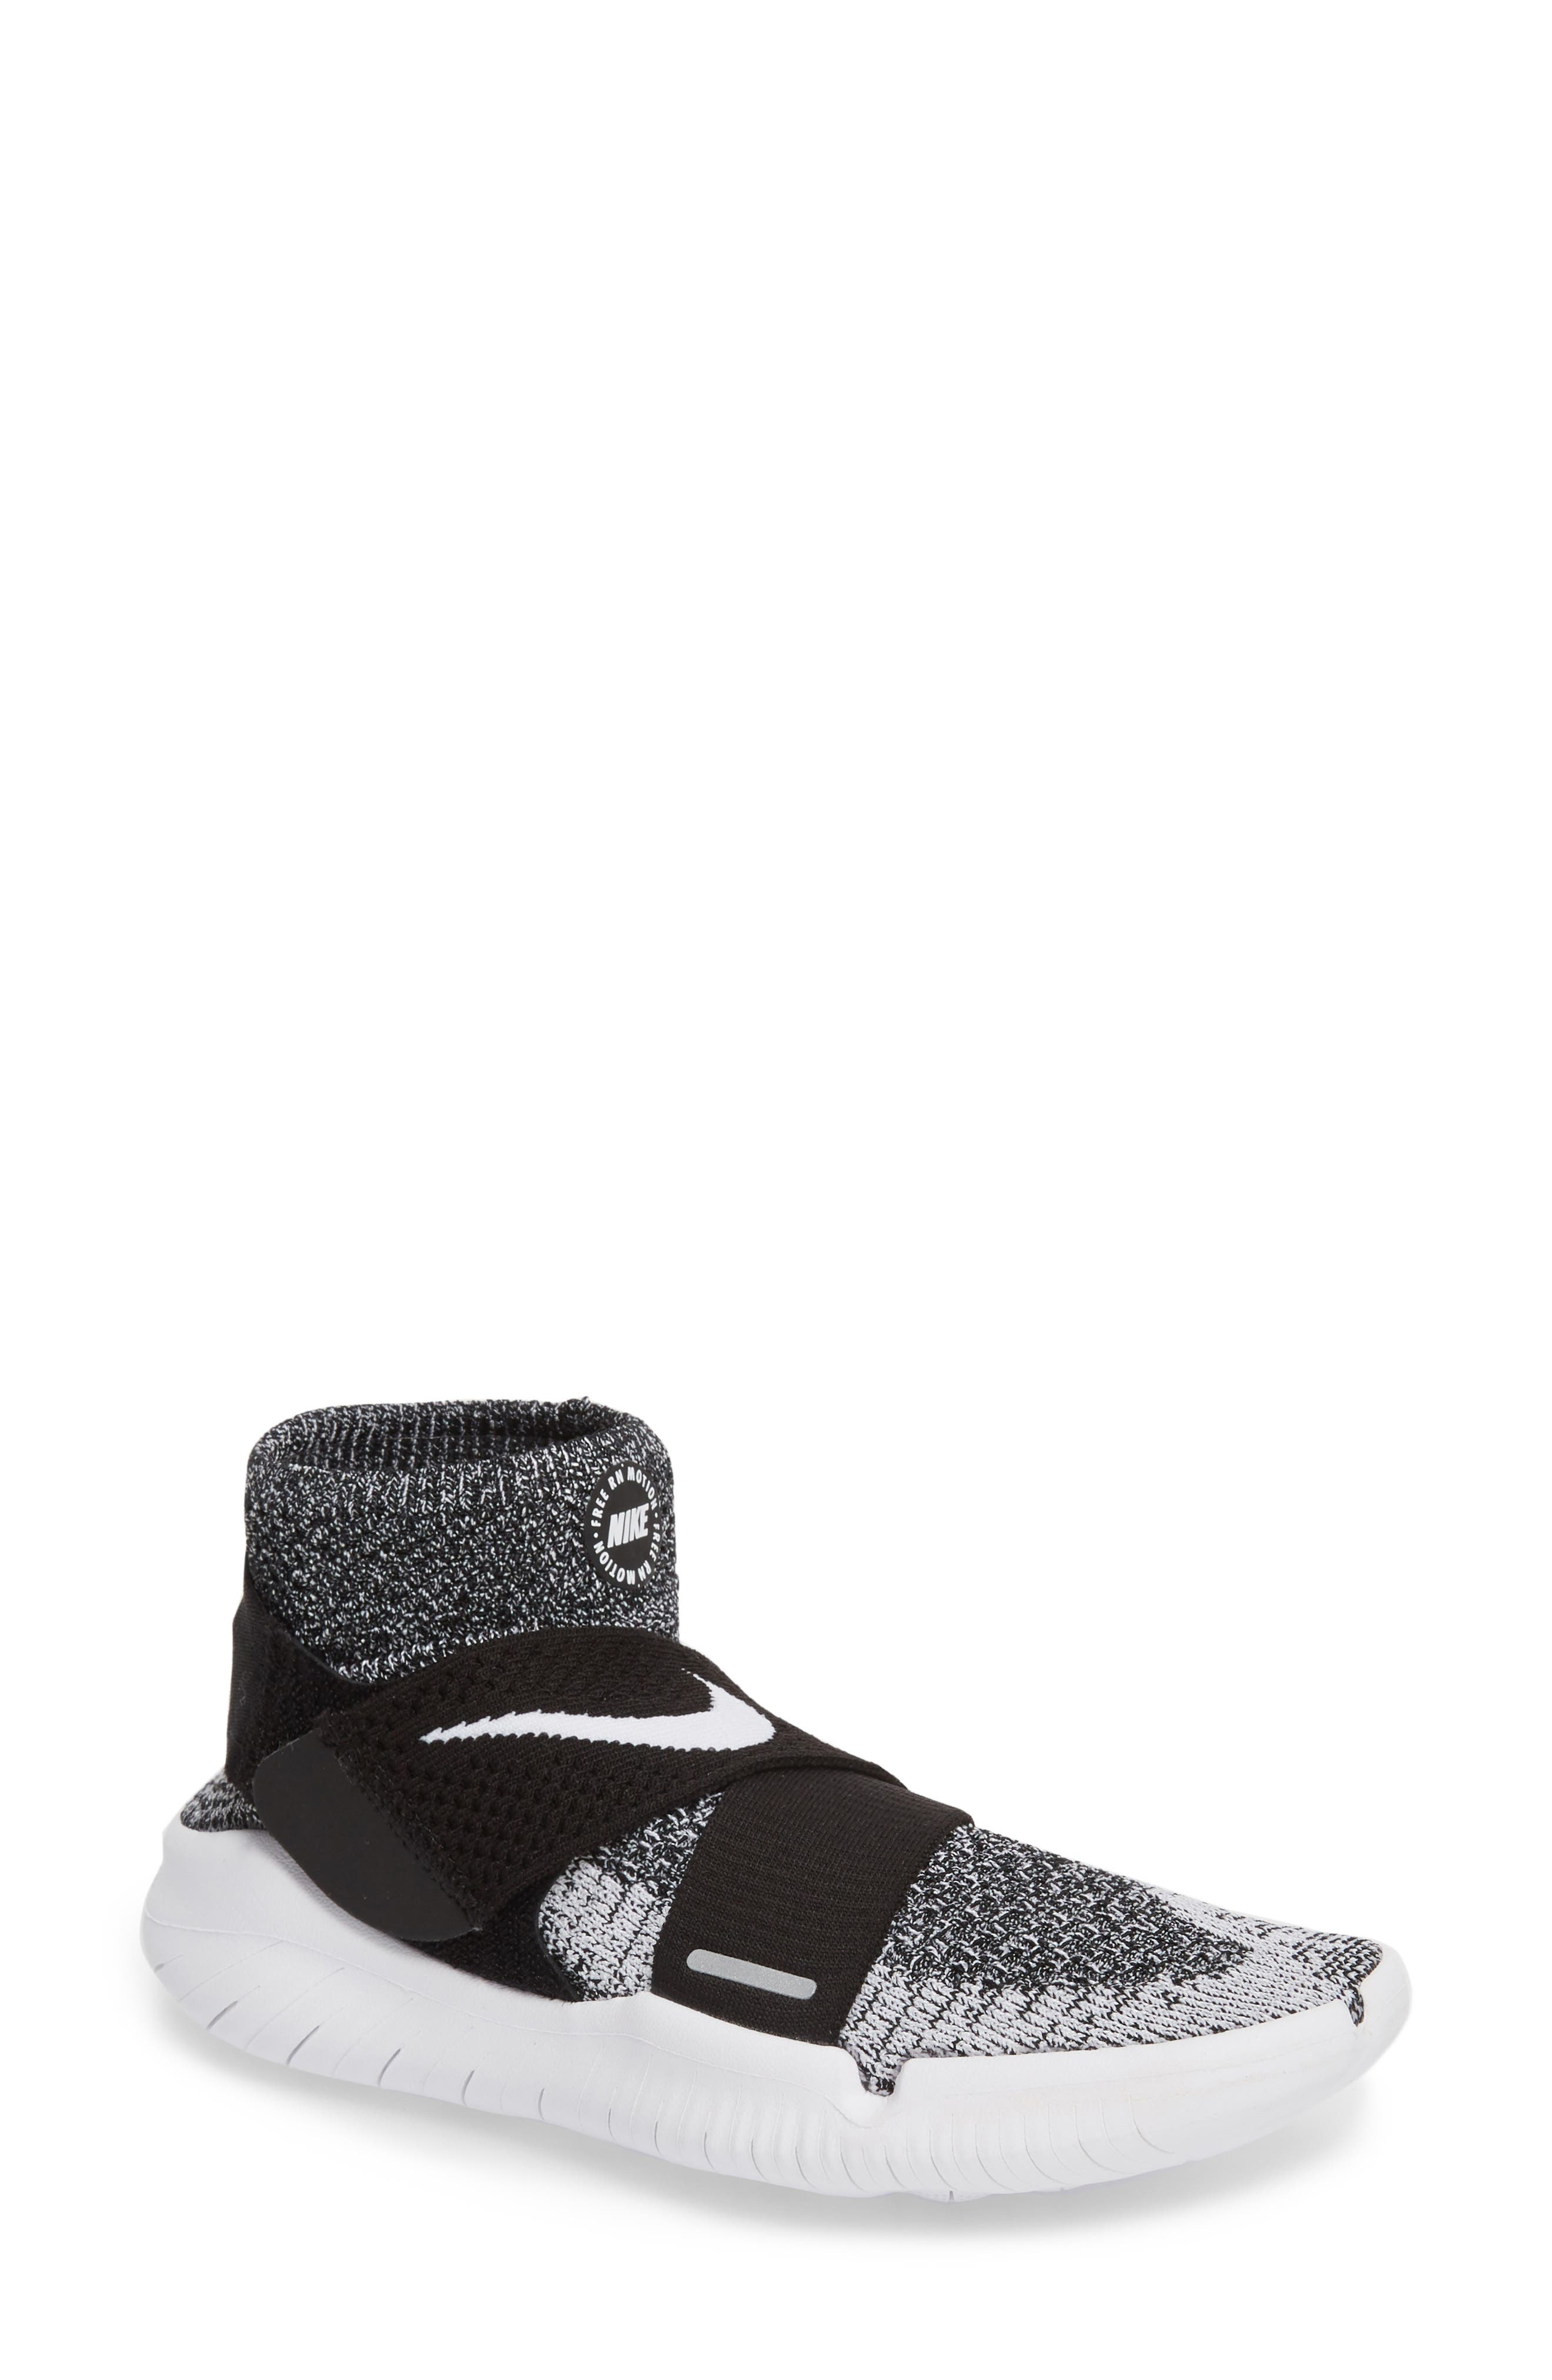 Main Image - Nike Free RN Motion Flyknit 2018 Running Shoe (Women)